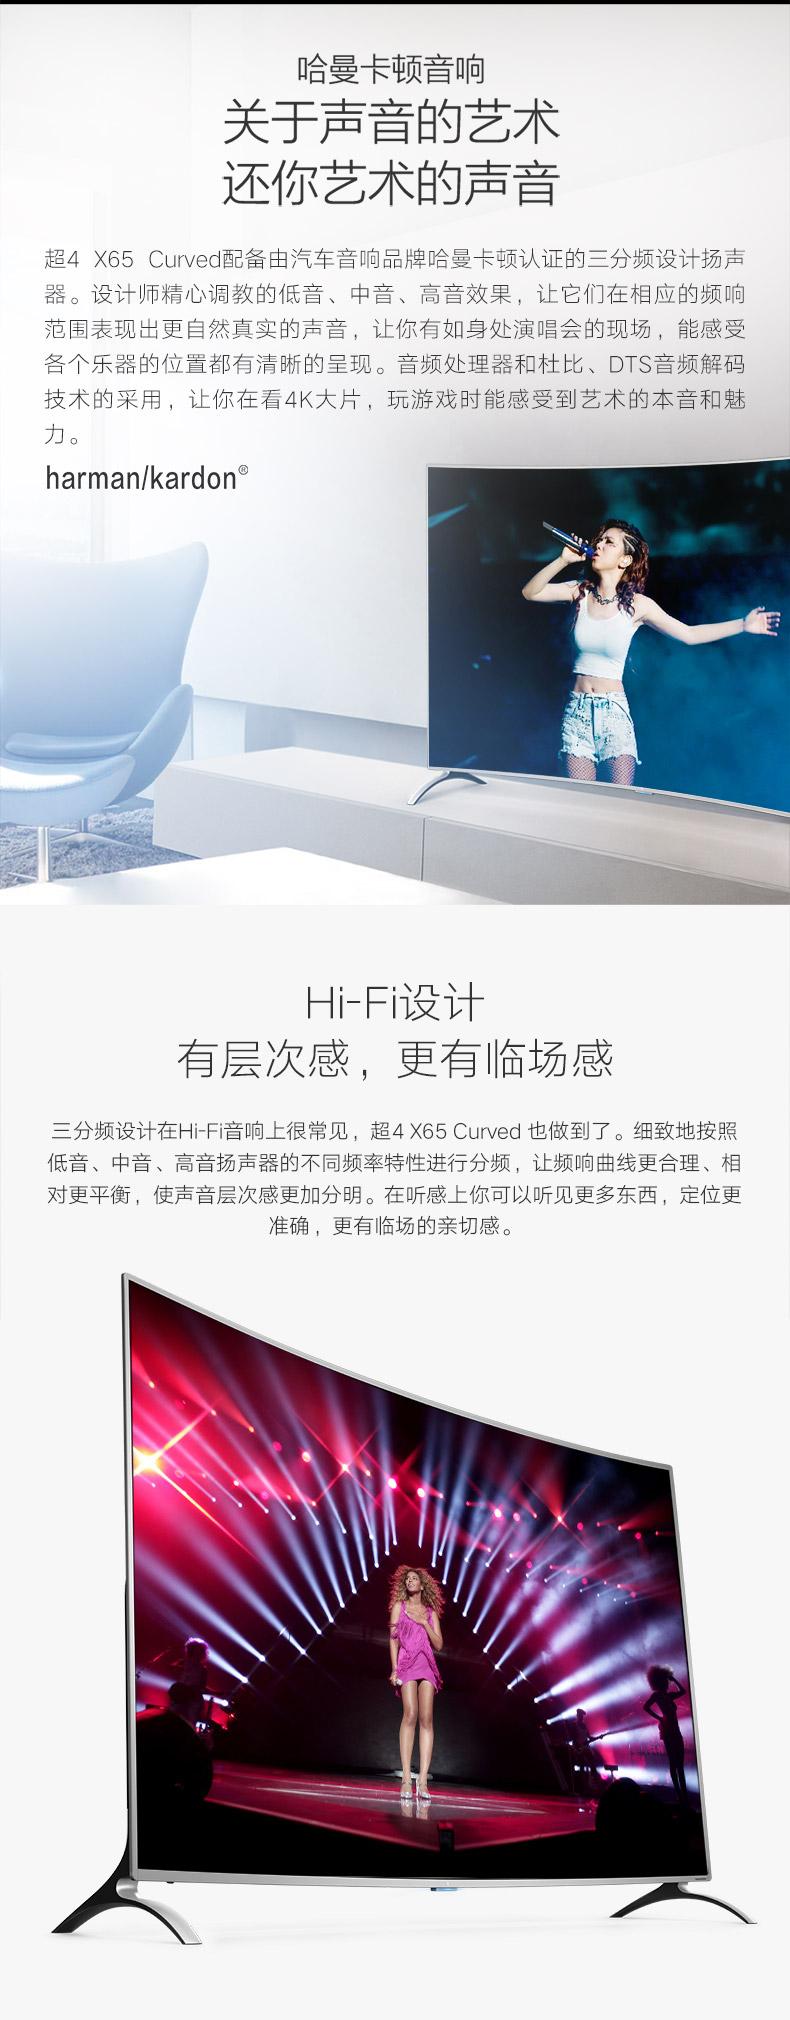 乐视TV 超4 X65 Curved65吋曲面智能4K液晶平板电视